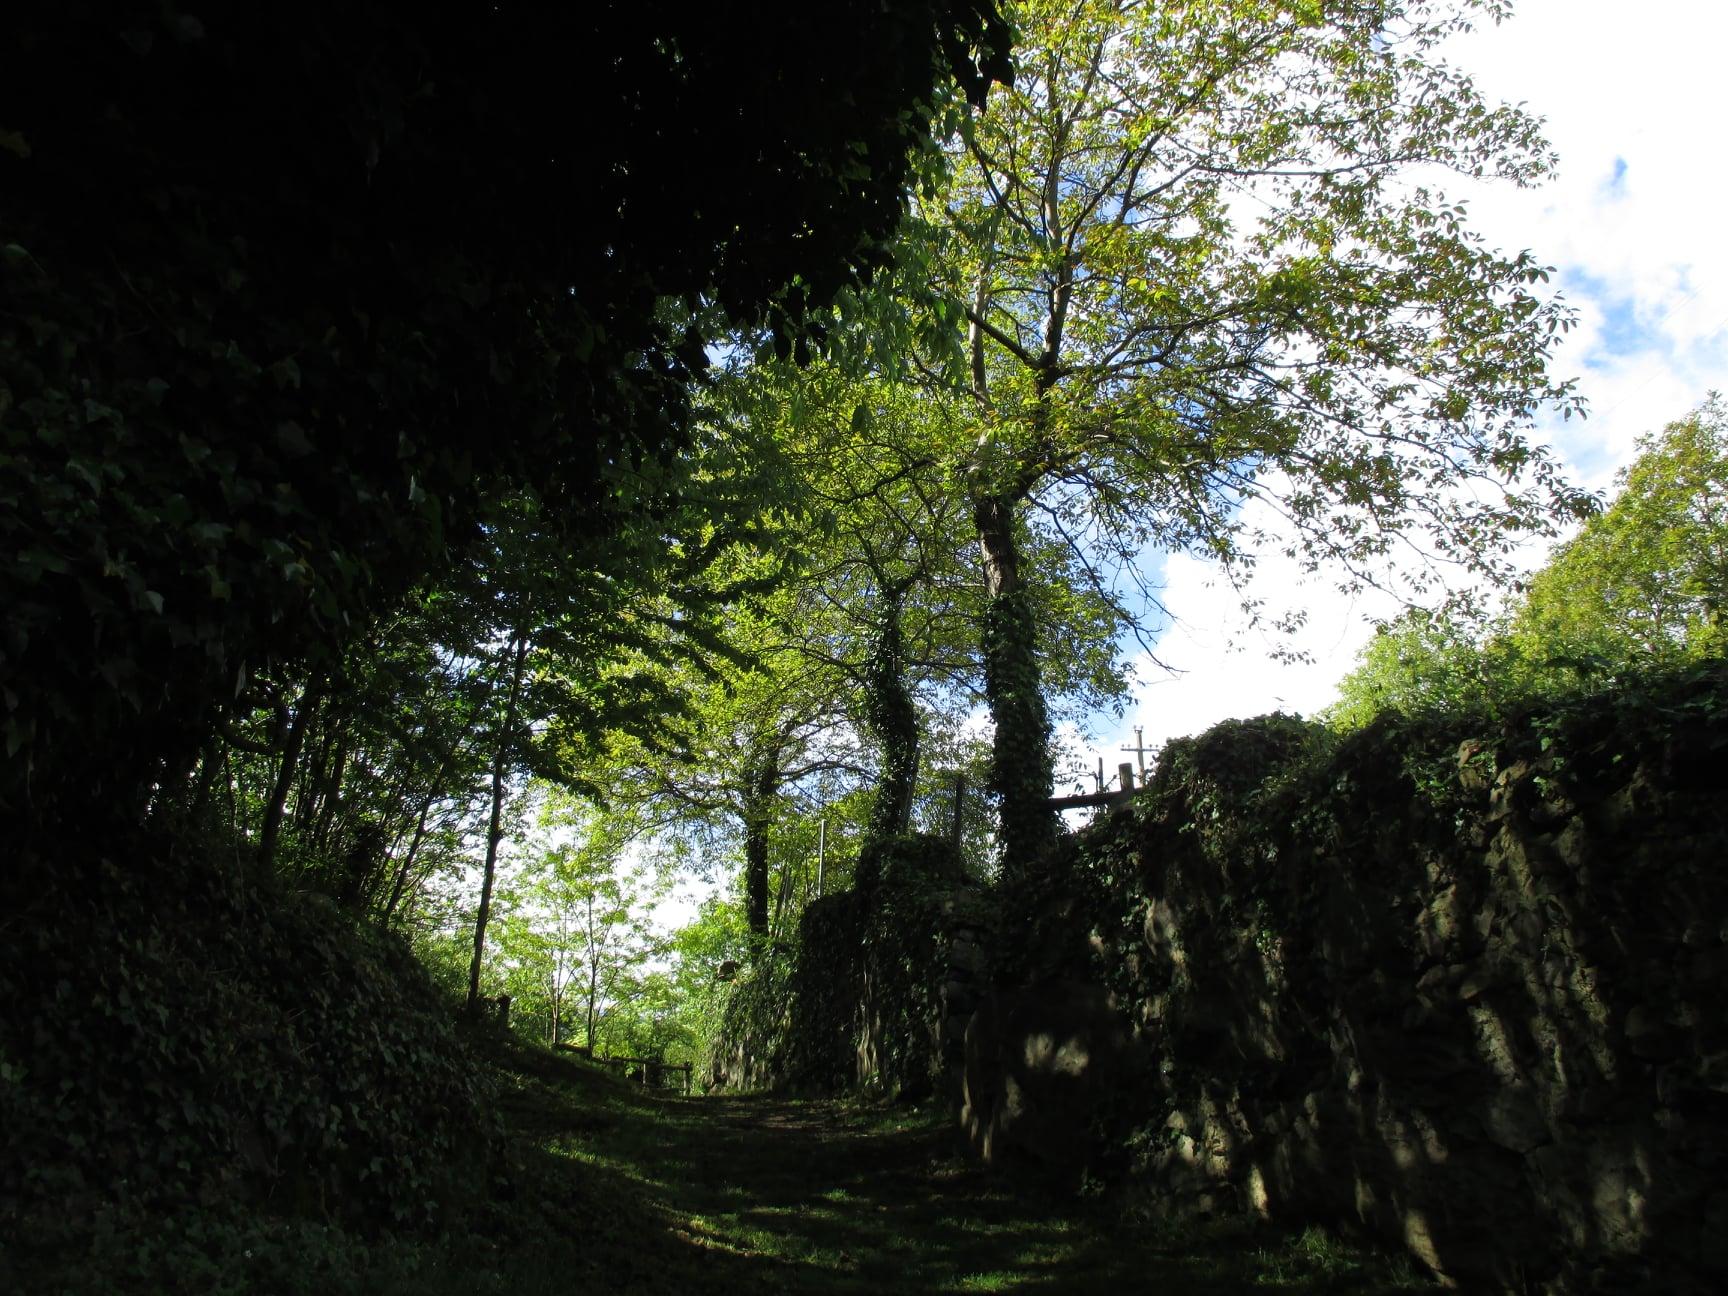 Courtesy of © Parco Archeologico Comunale Seradina-Bedolina